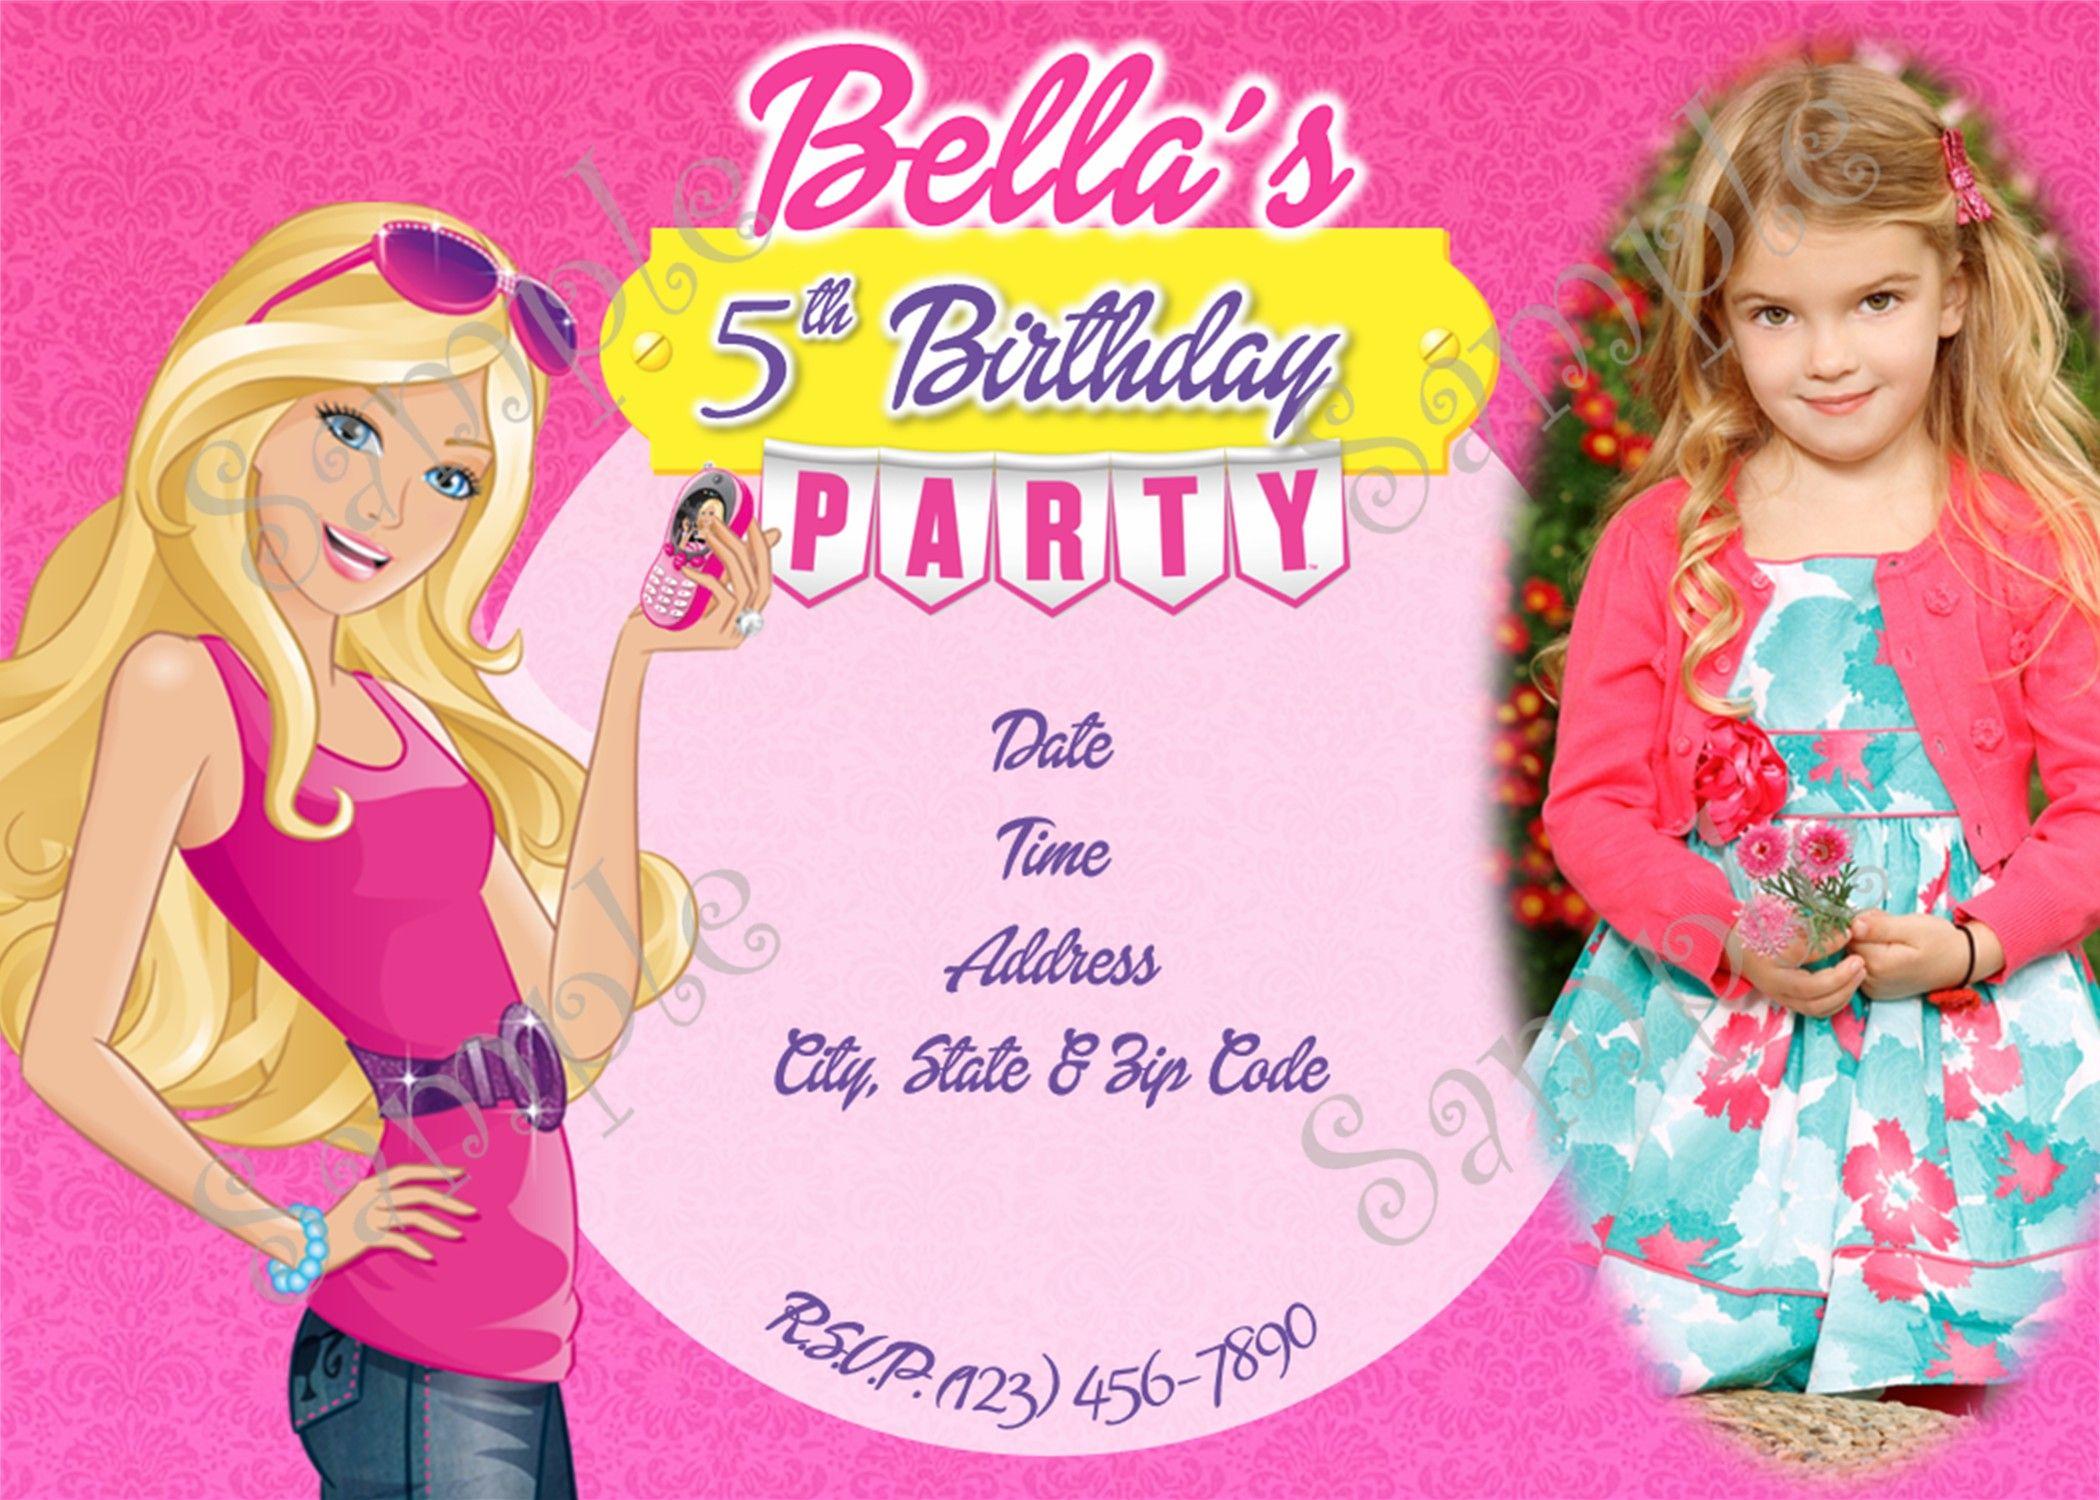 Barbie Birthday Invitation 5x7 or 4x6 Inches